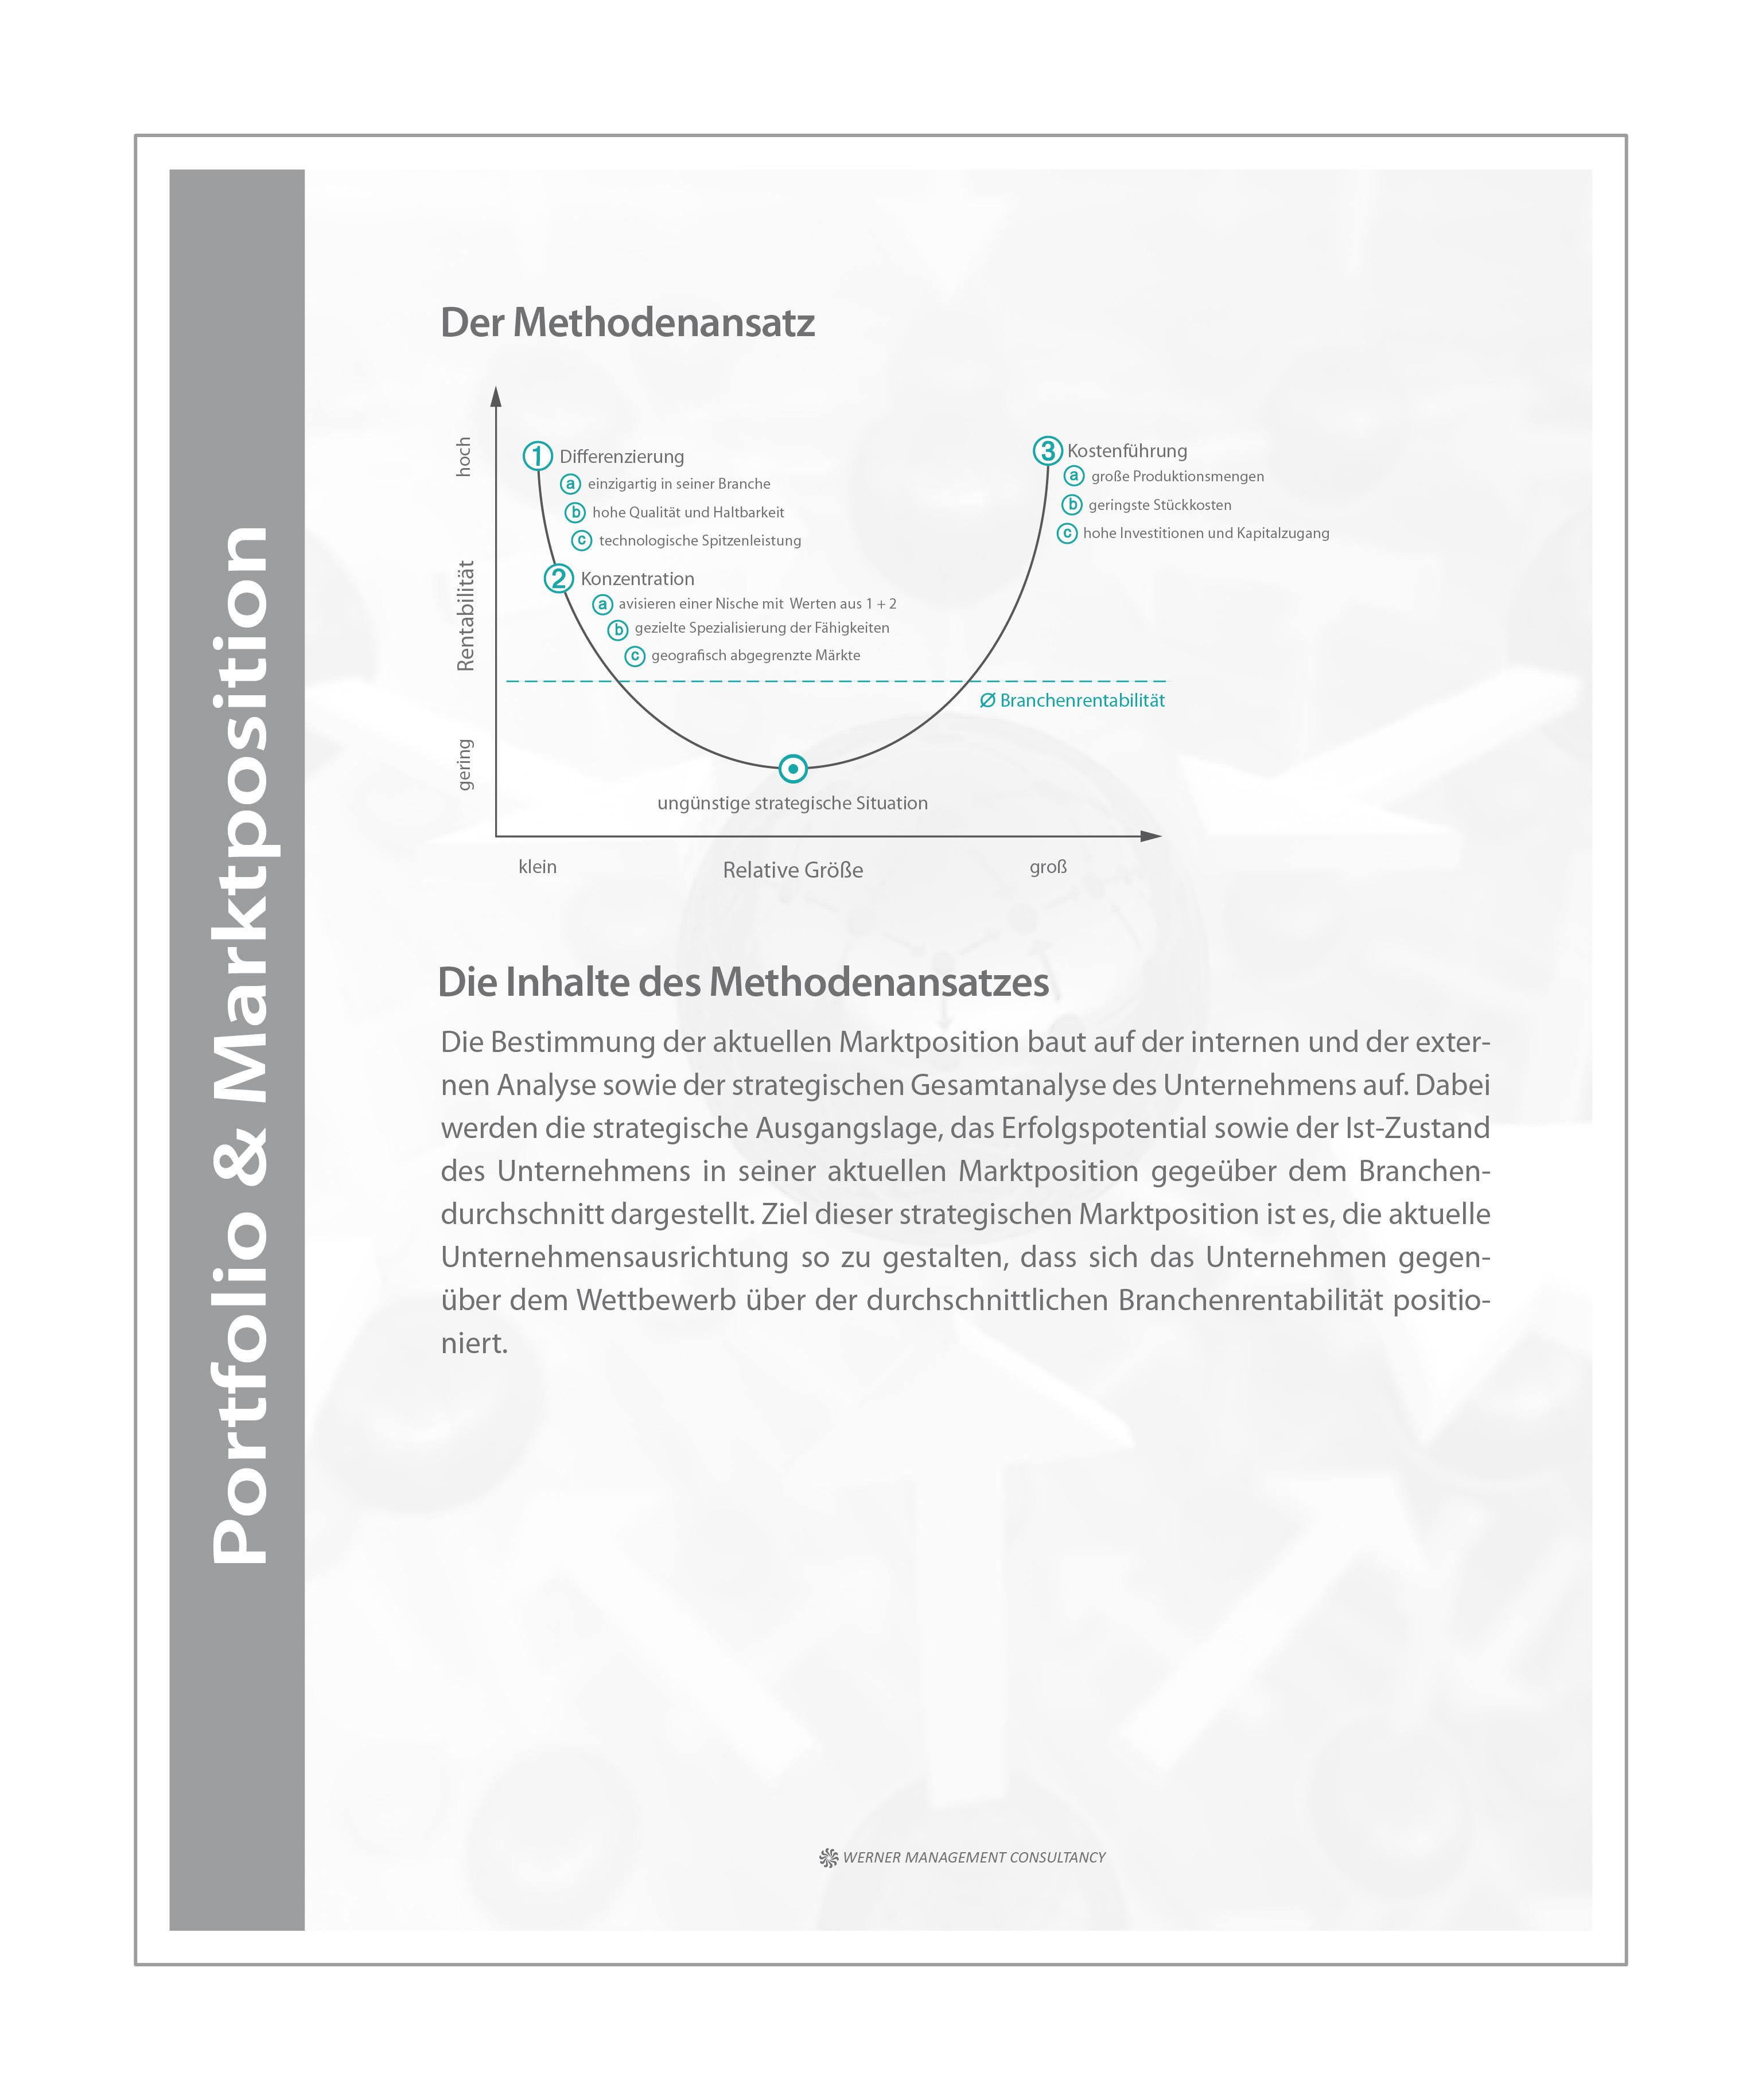 WMC Broschüre Business Development Phase-2 Methode